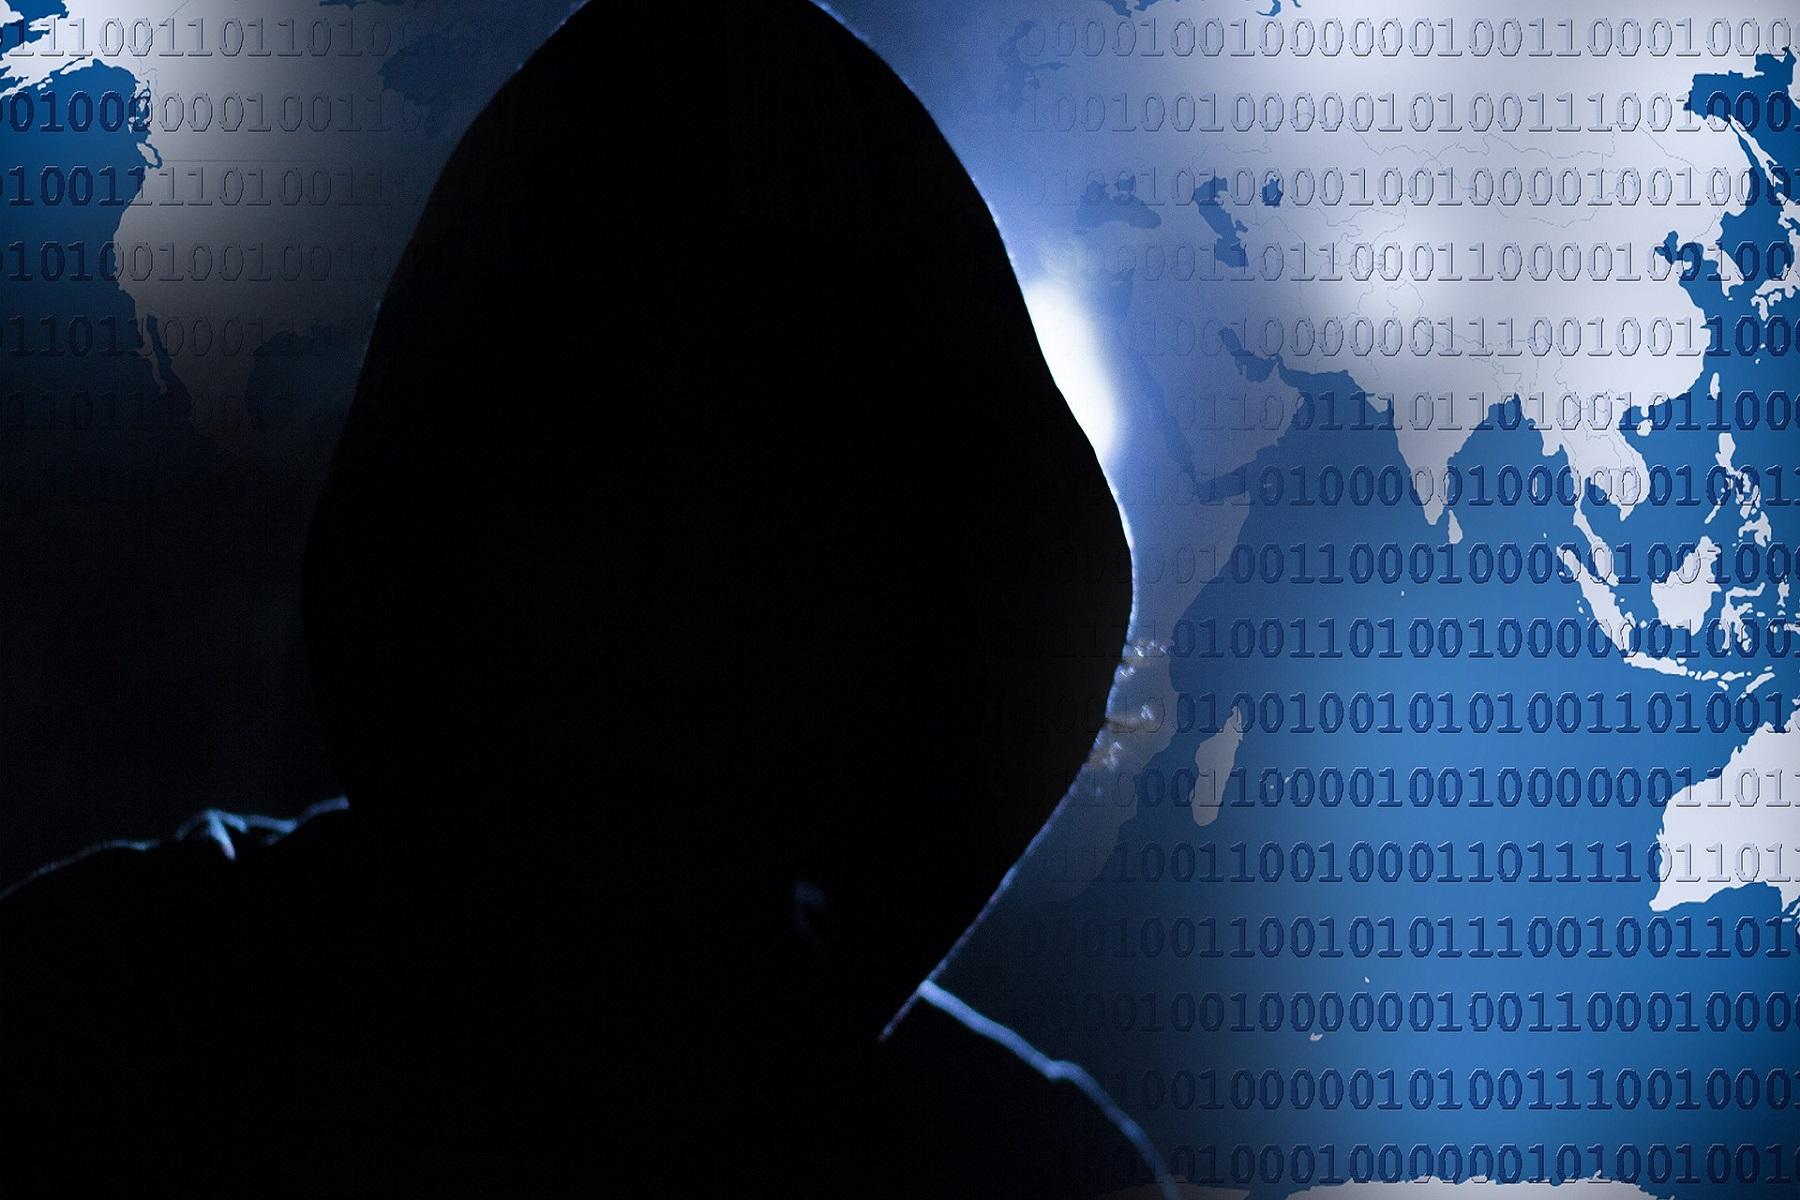 Microsoft: Προειδοποίηση για ρωσικές κυβερνοεπιθέσεις σε κυβερνητικές υπηρεσίες